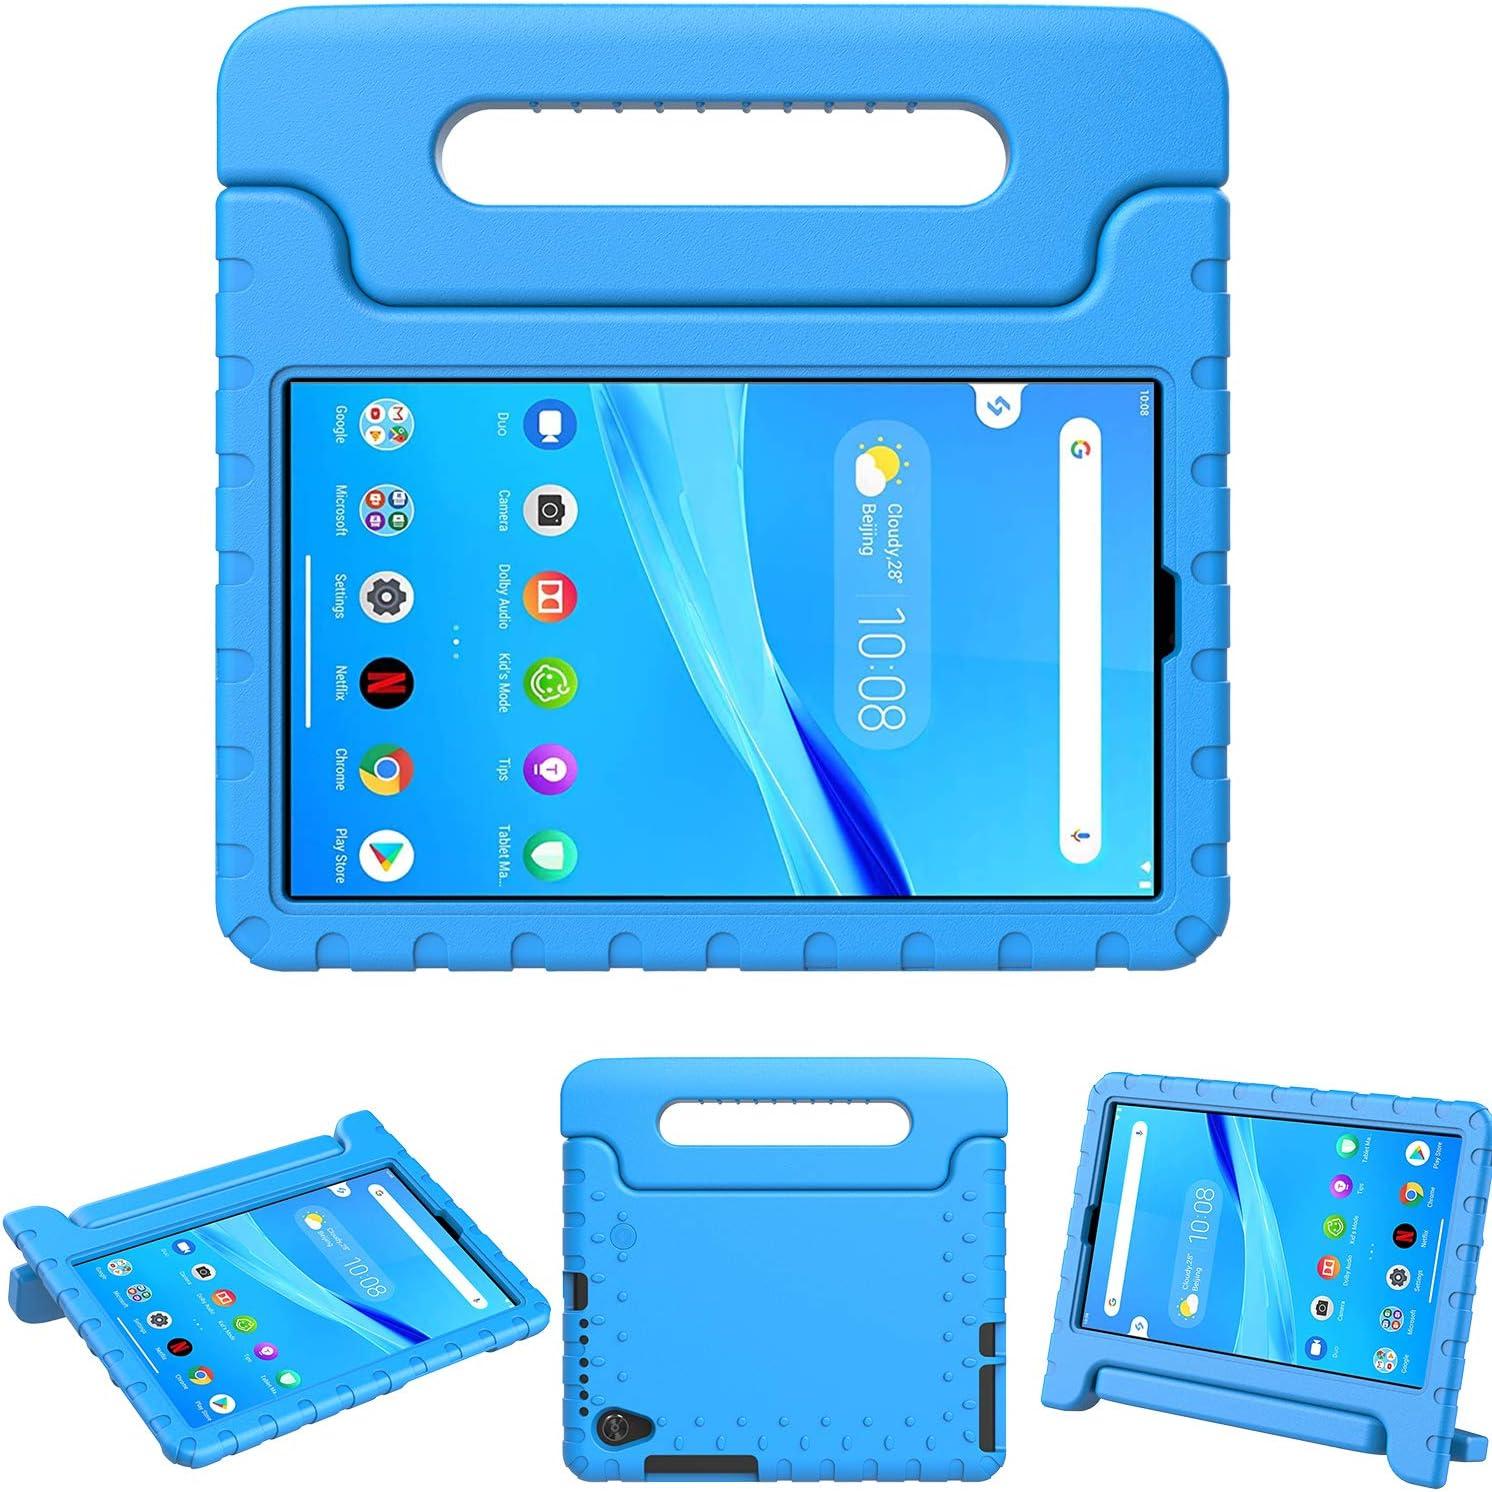 TeeFity Lenovo Tab M8 HD/Smart Tab M8 / Tab M8 FHD 2019 Tablet Kids Case, Shockproof Light Weight Handle Stand Kids Case for Lenovo Tab M8 TB-8505F TB-8505X TB-8705F TB-8705N 2019 Tablet, Blue